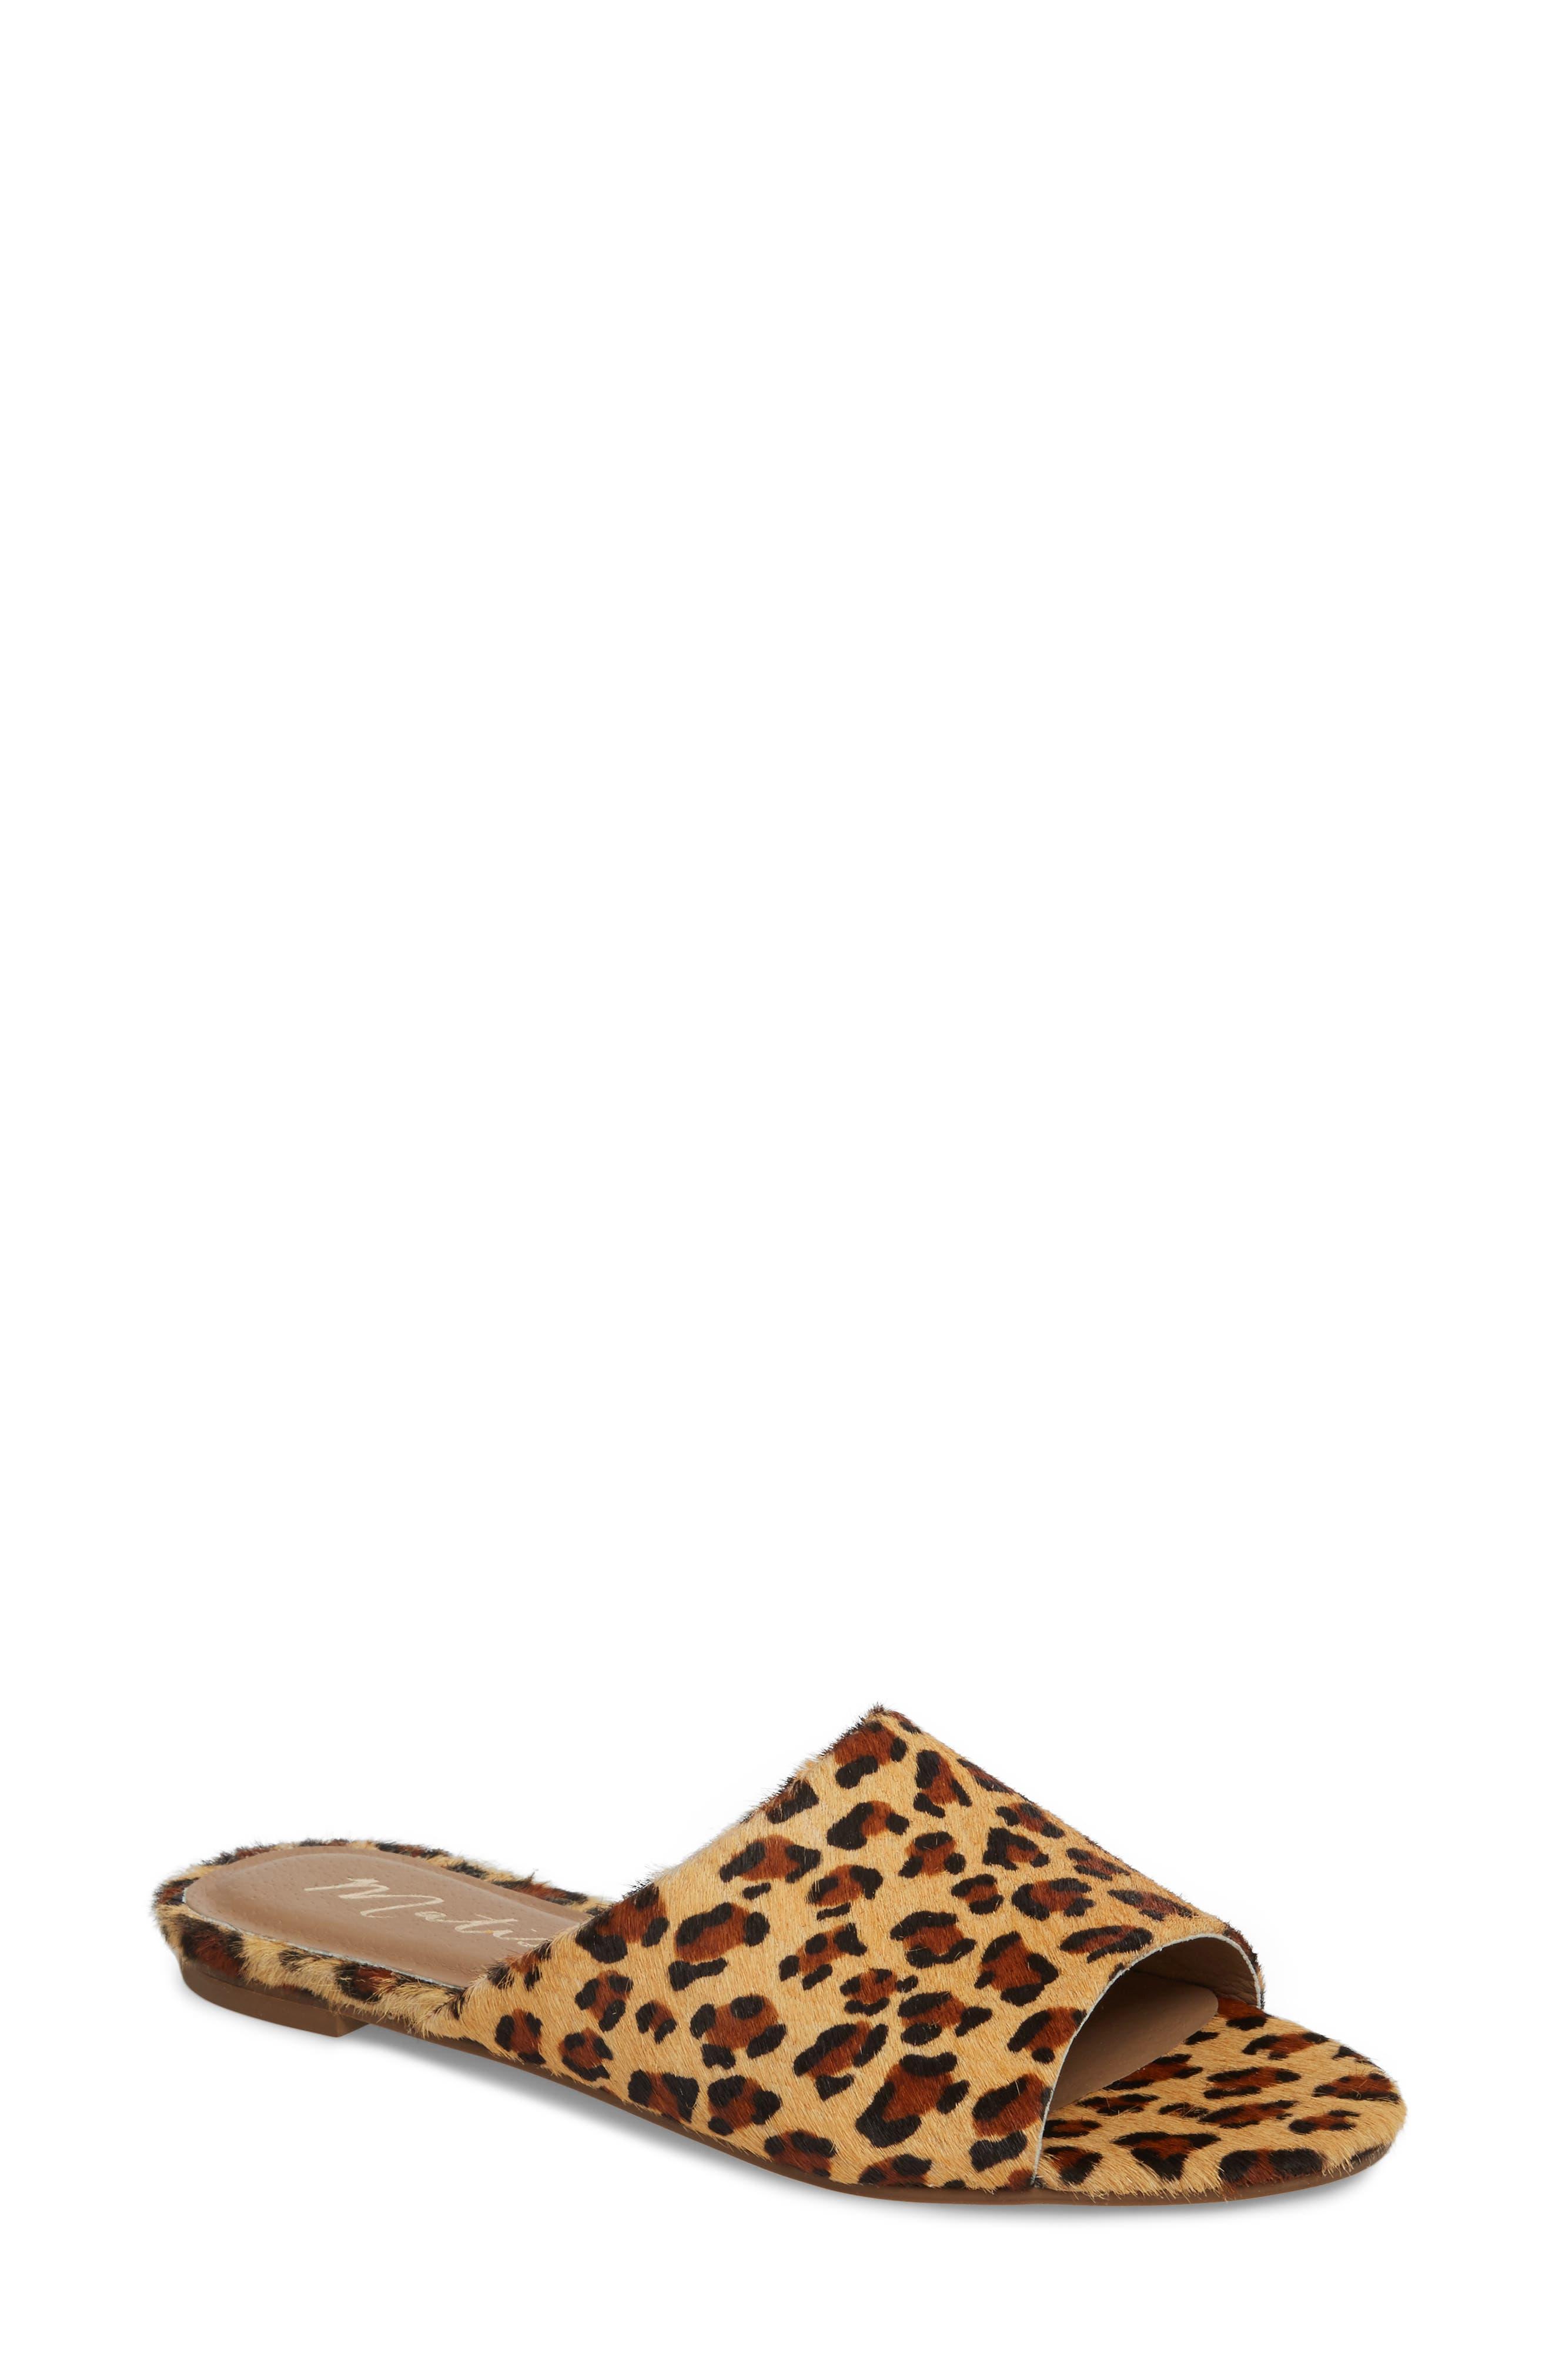 Lira Genuine Calf Hair Sandal,                         Main,                         color, LEOPARD LEATHER